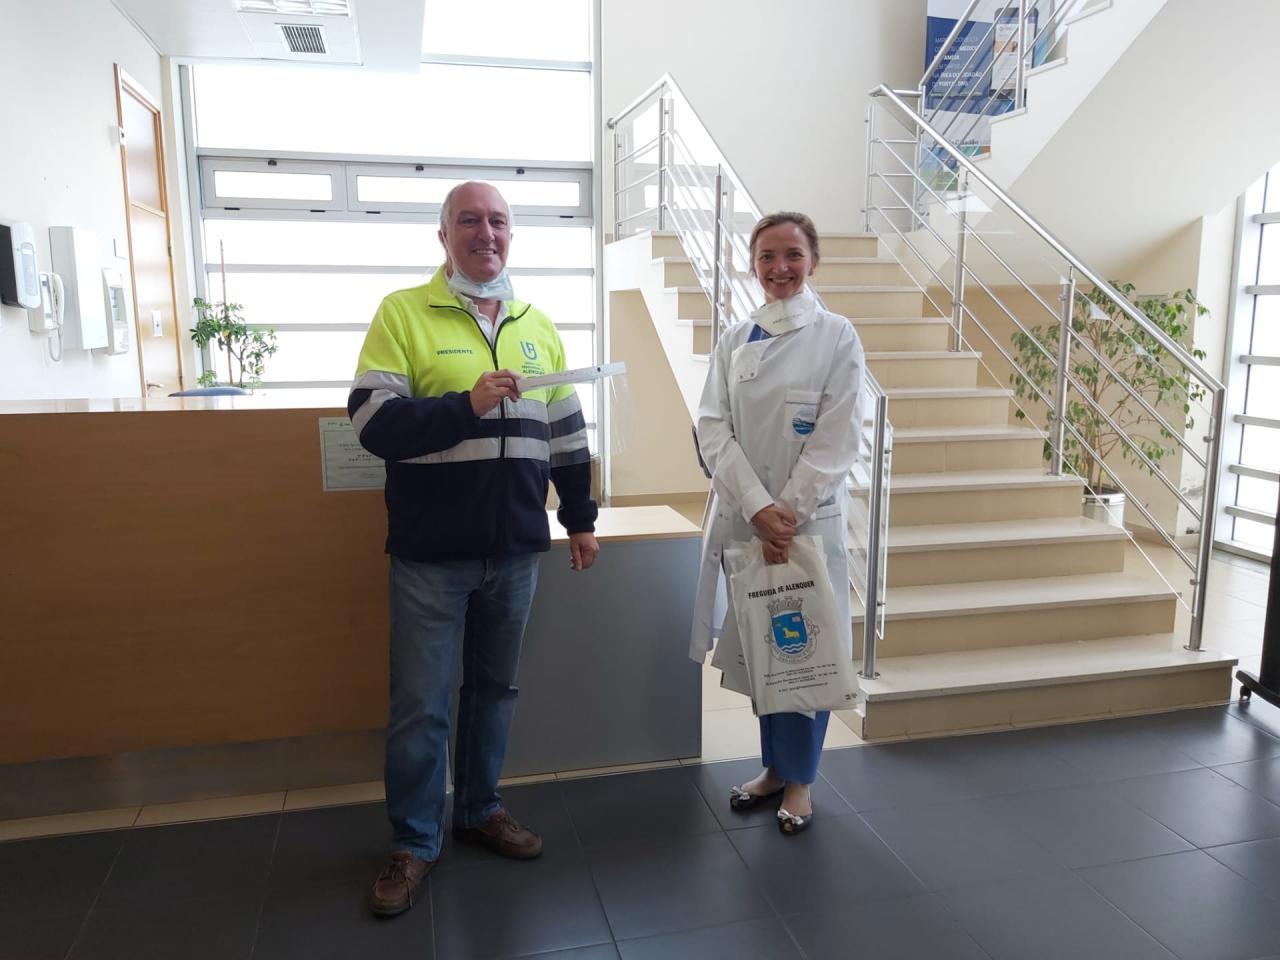 Freguesia oferece 35 viseiras ao Centro de Saúde de Alenquer